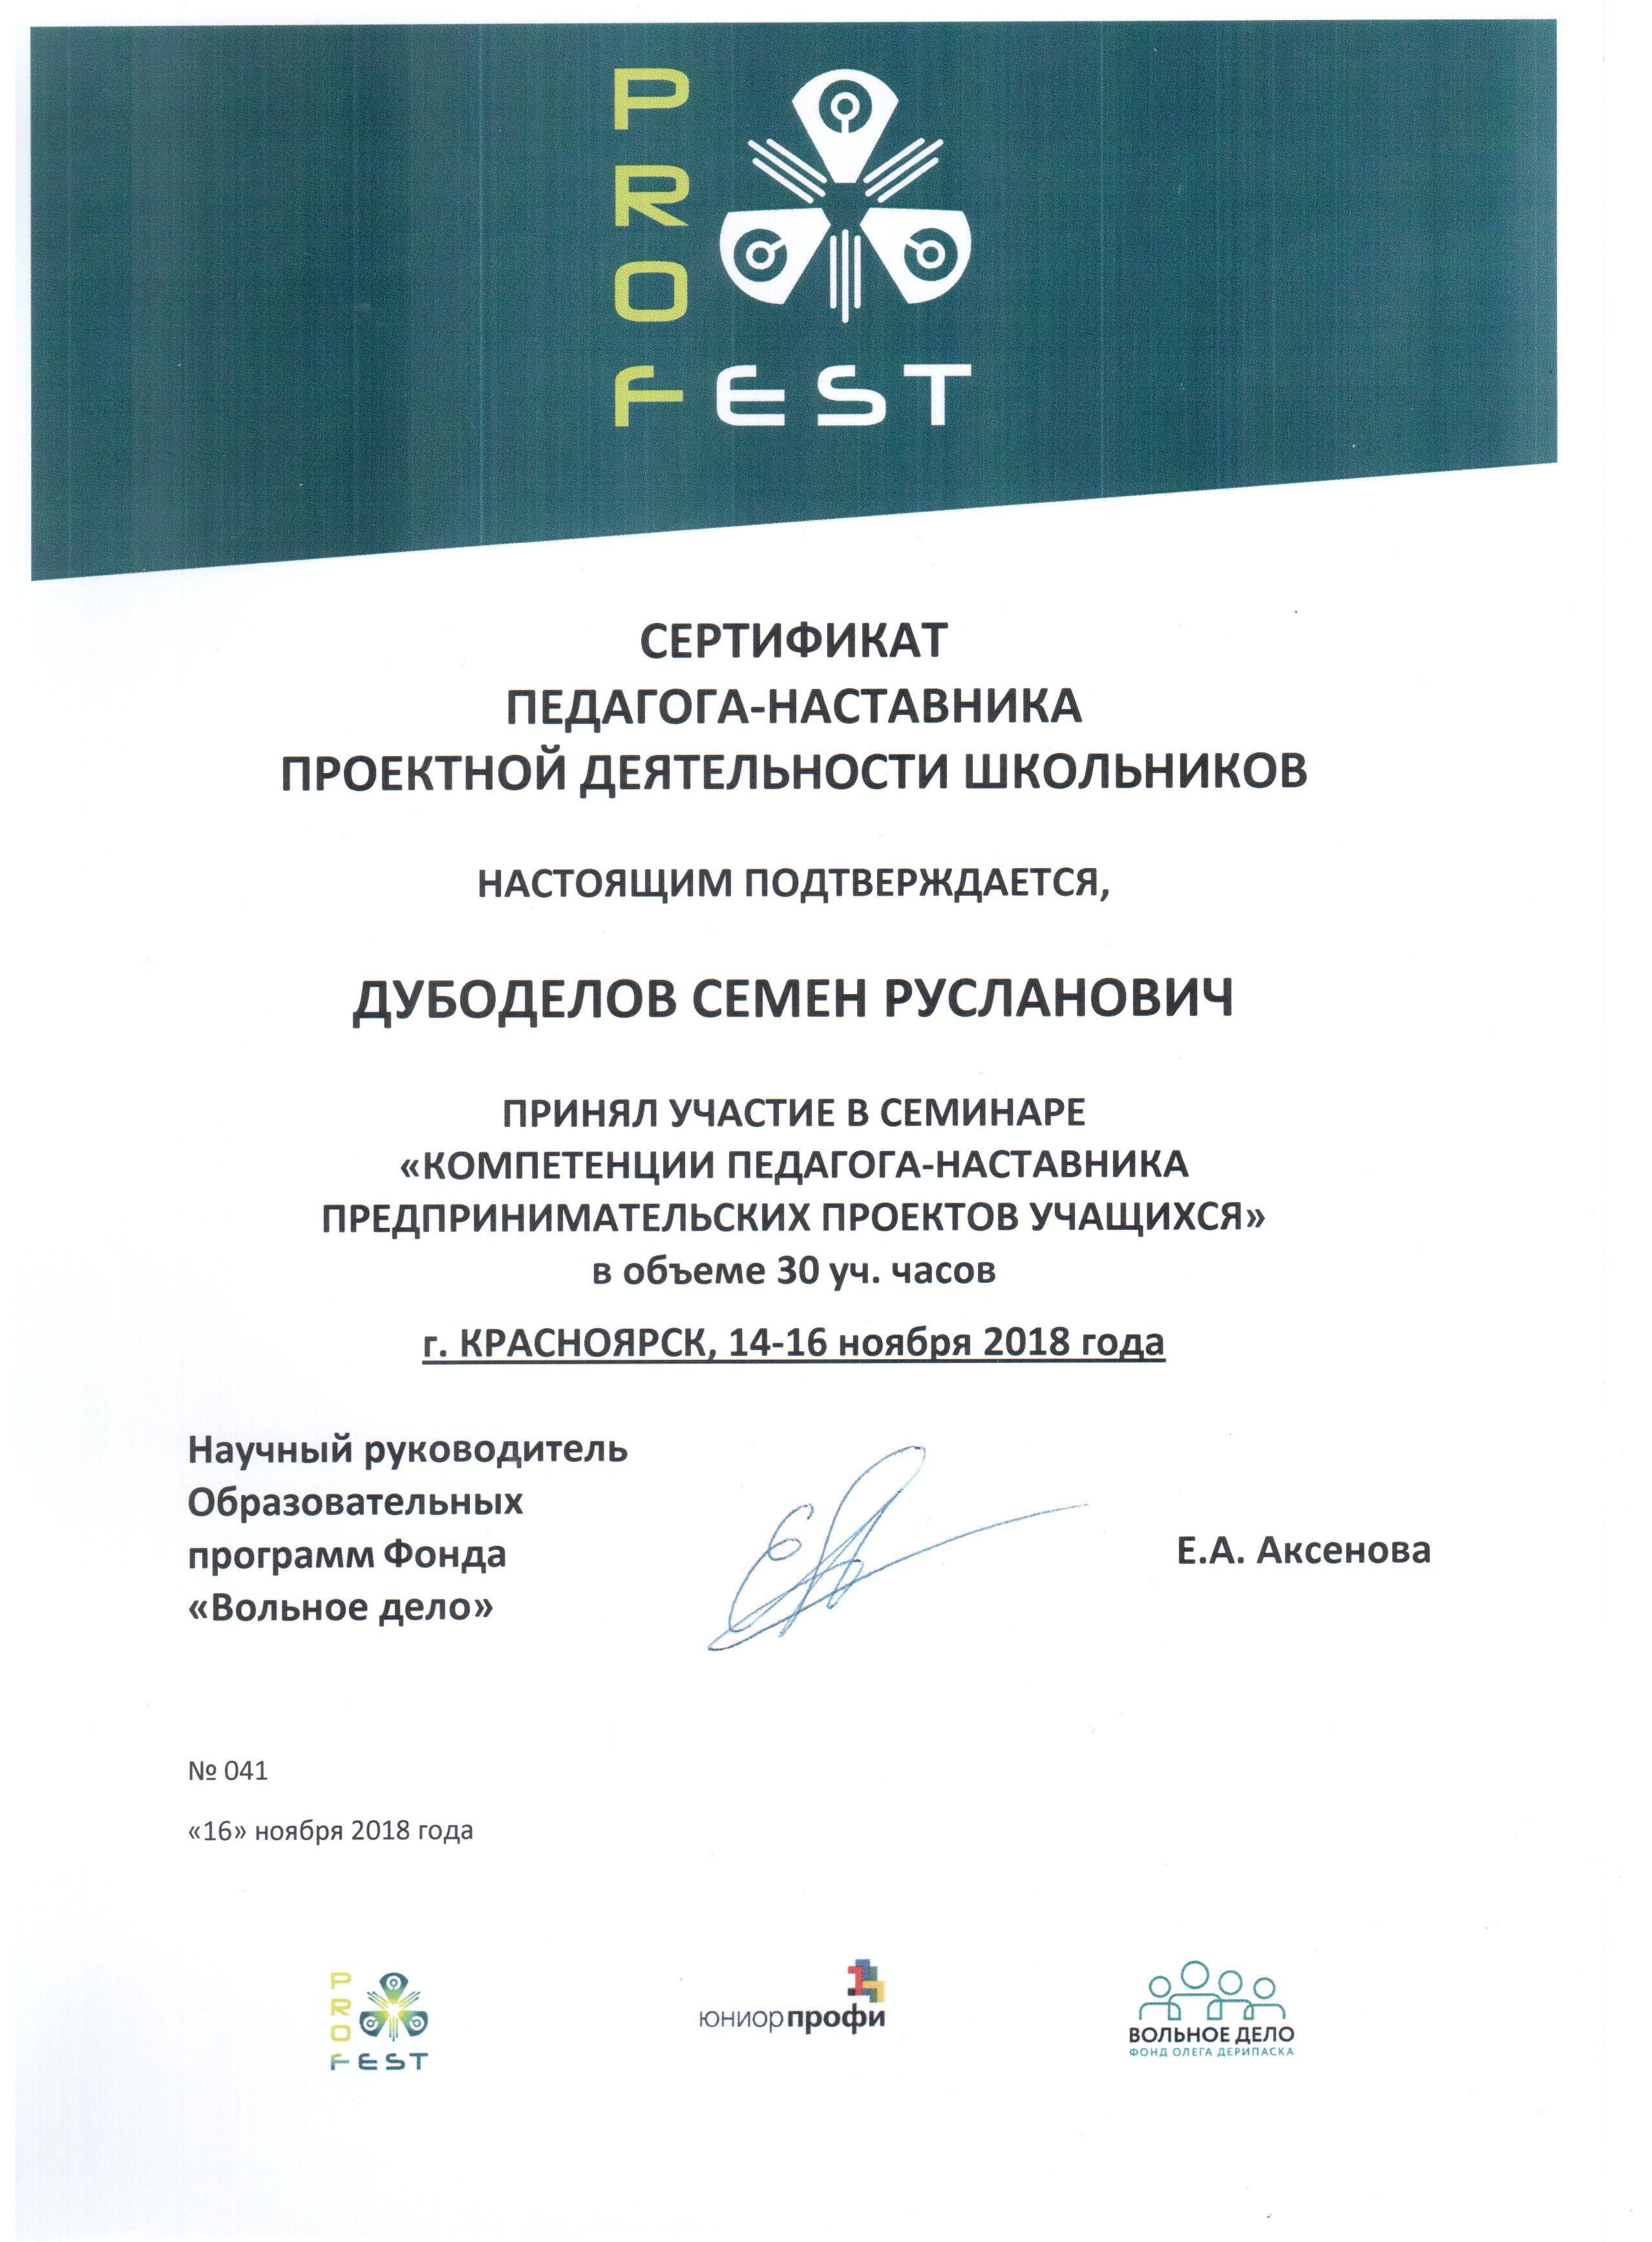 2018.11.14-16_сертификат ДСР.jpg